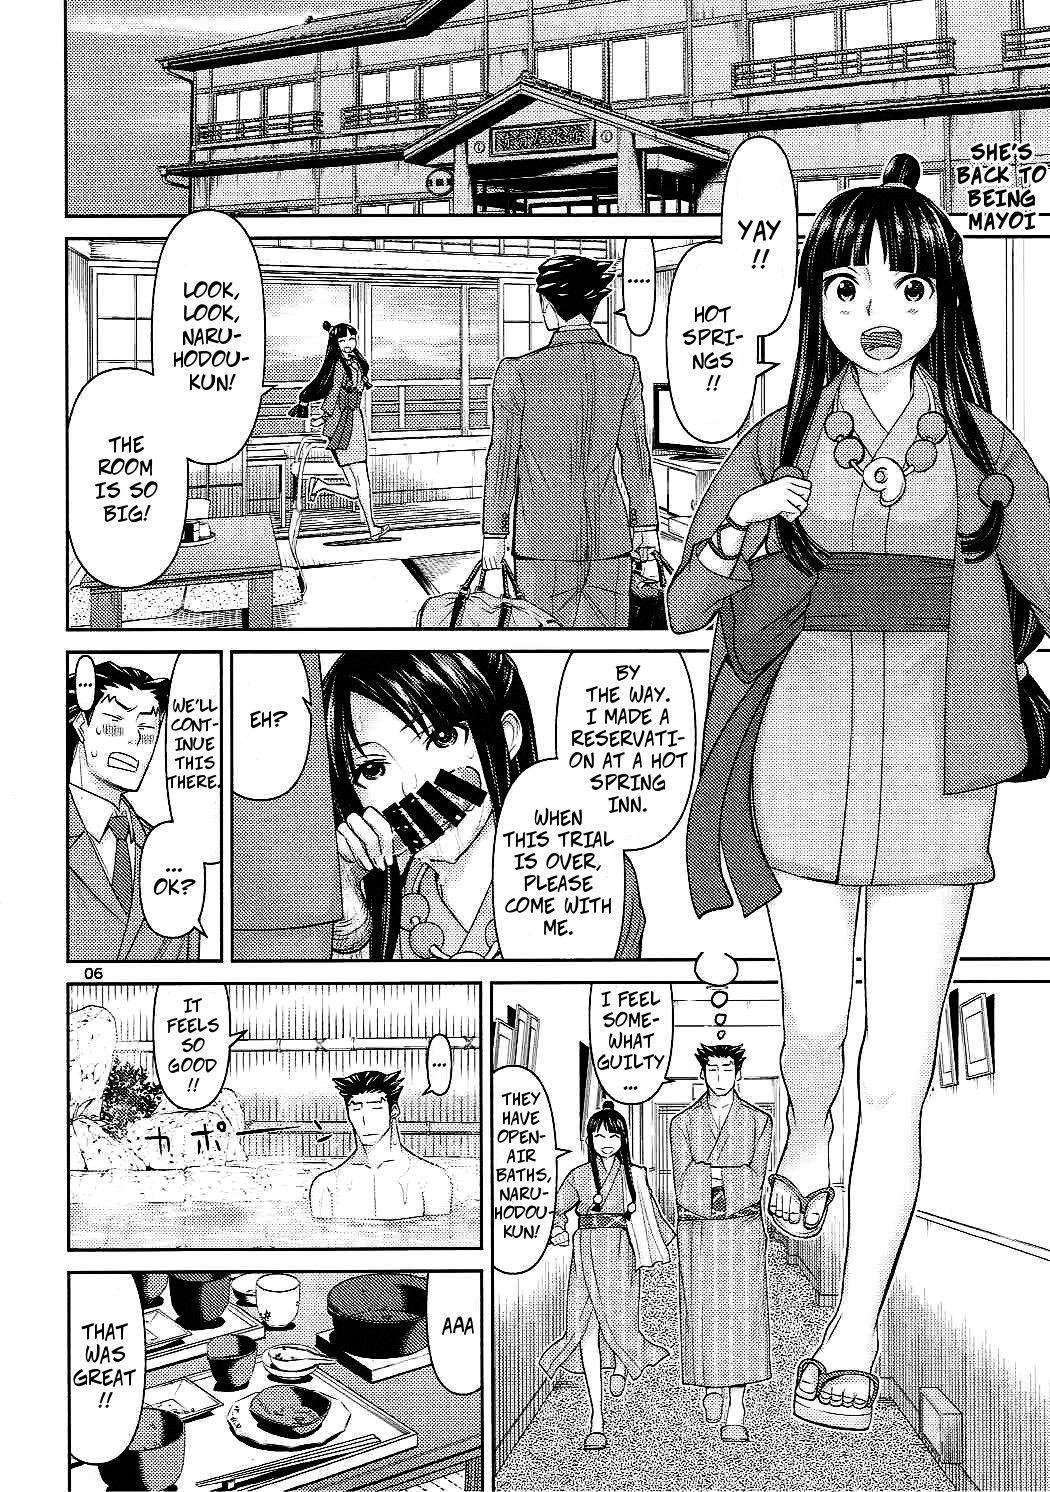 (C90) [Low Thrust (Tsunagami)] Igi nashi -- No Objection (Ace Attorney) [English] 4